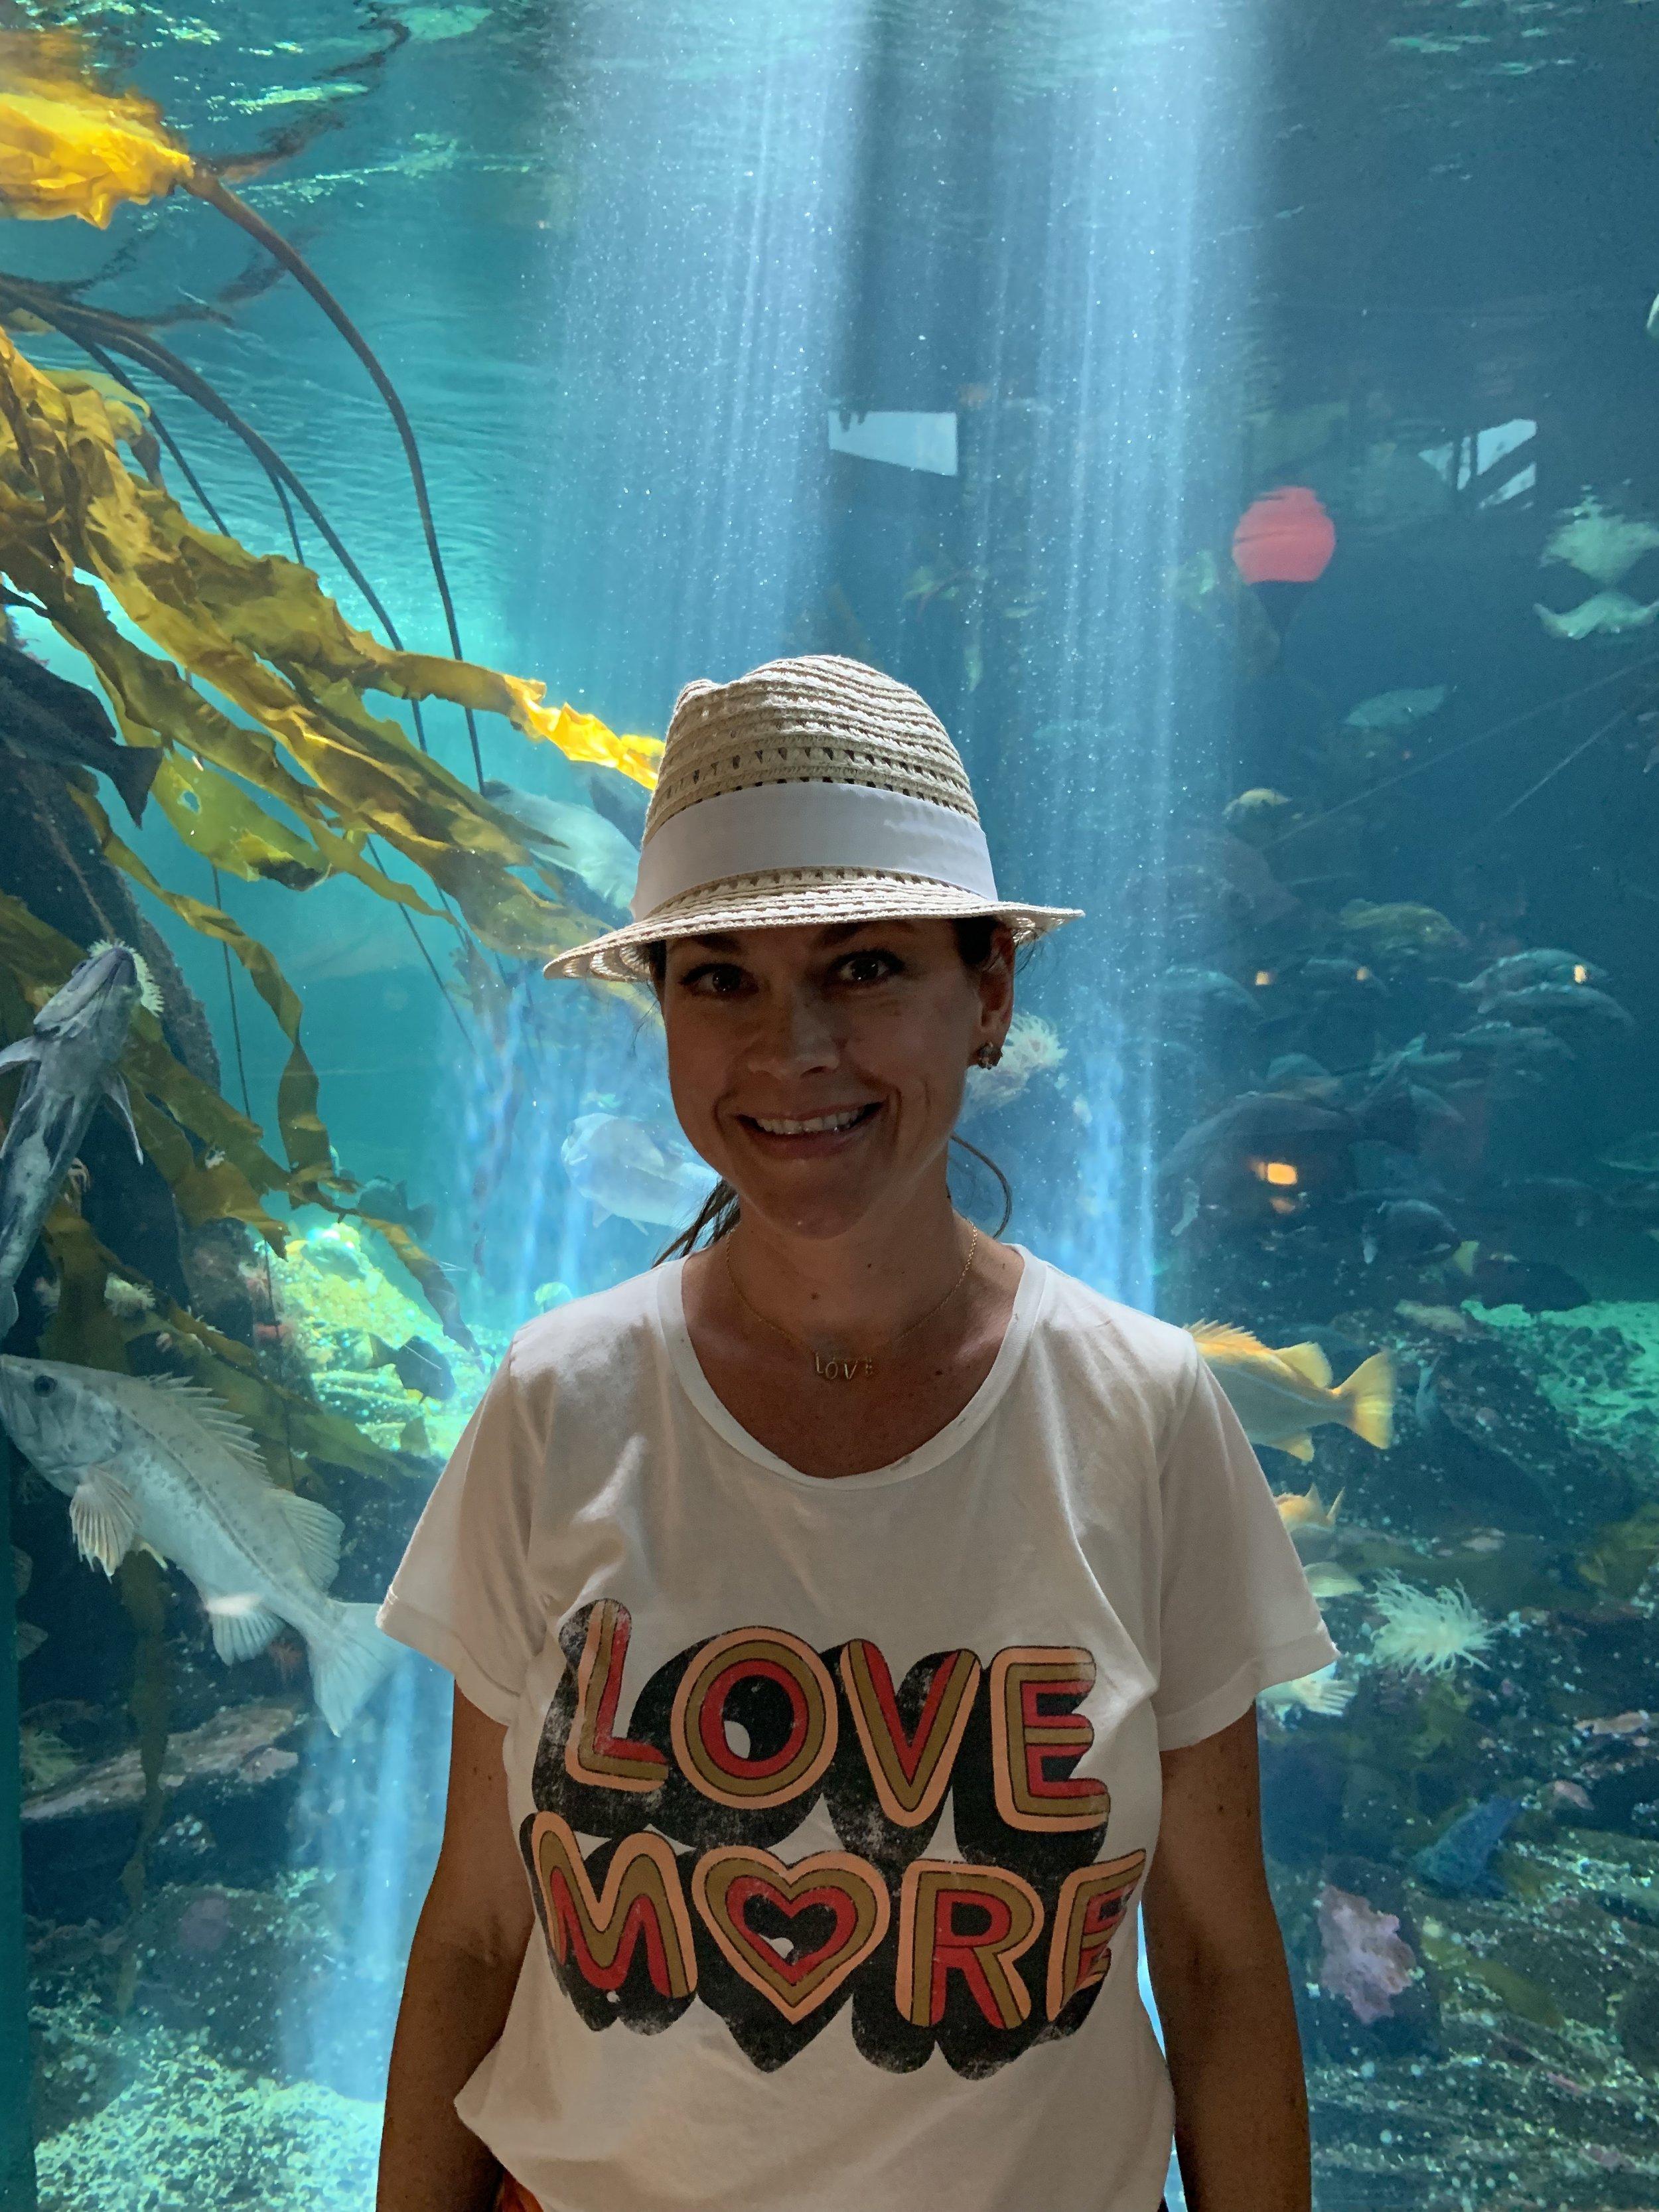 Shan bday aquarium.jpg